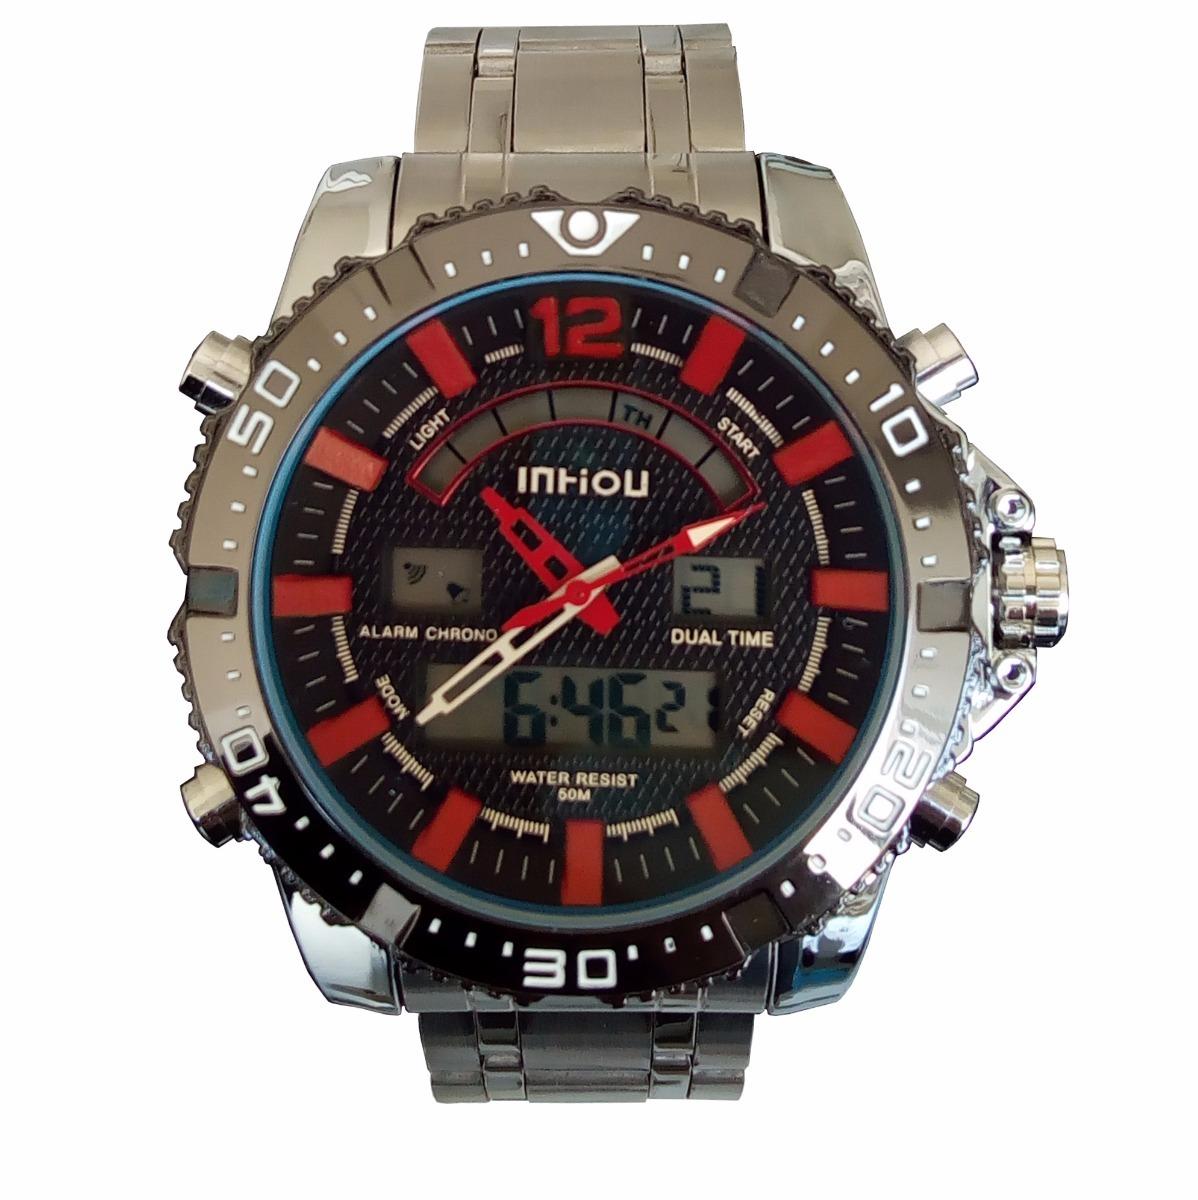 197b5638ee7 Relógio Masculino Militar Inhou 8010 Aço Inox Prova D água - R  120 ...